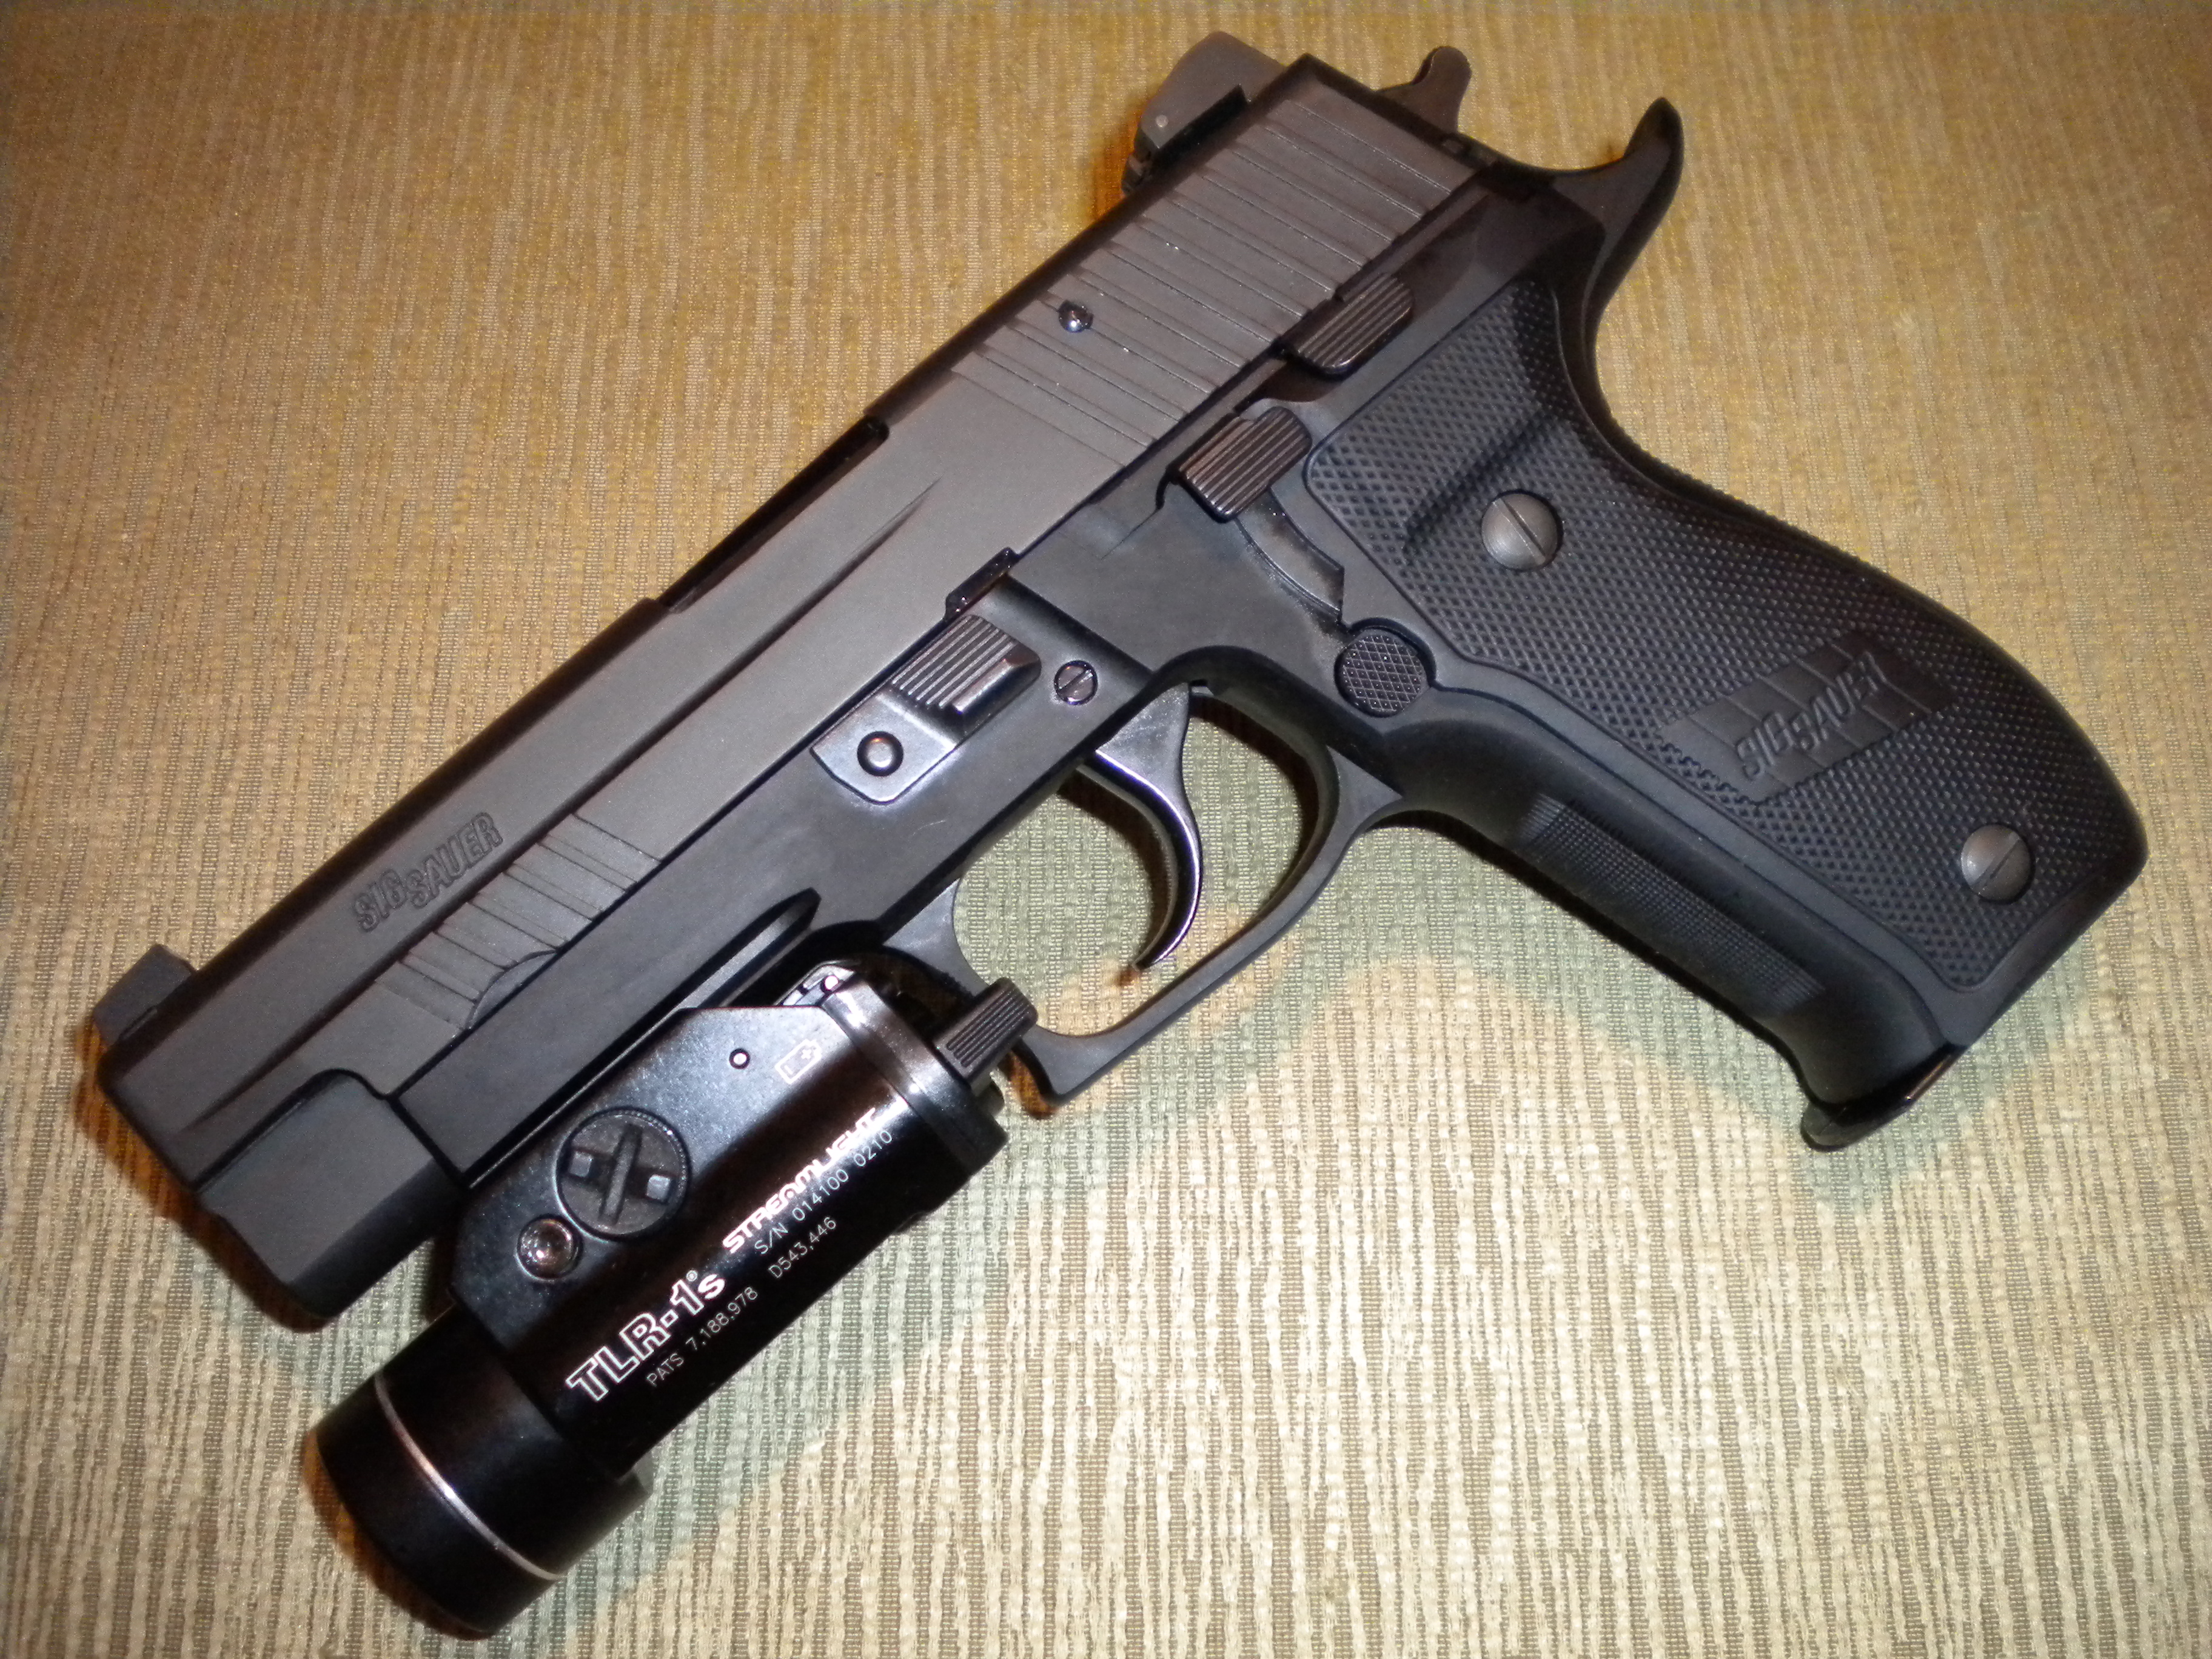 File:P226 Elite Dark.JPG - Wikipedia